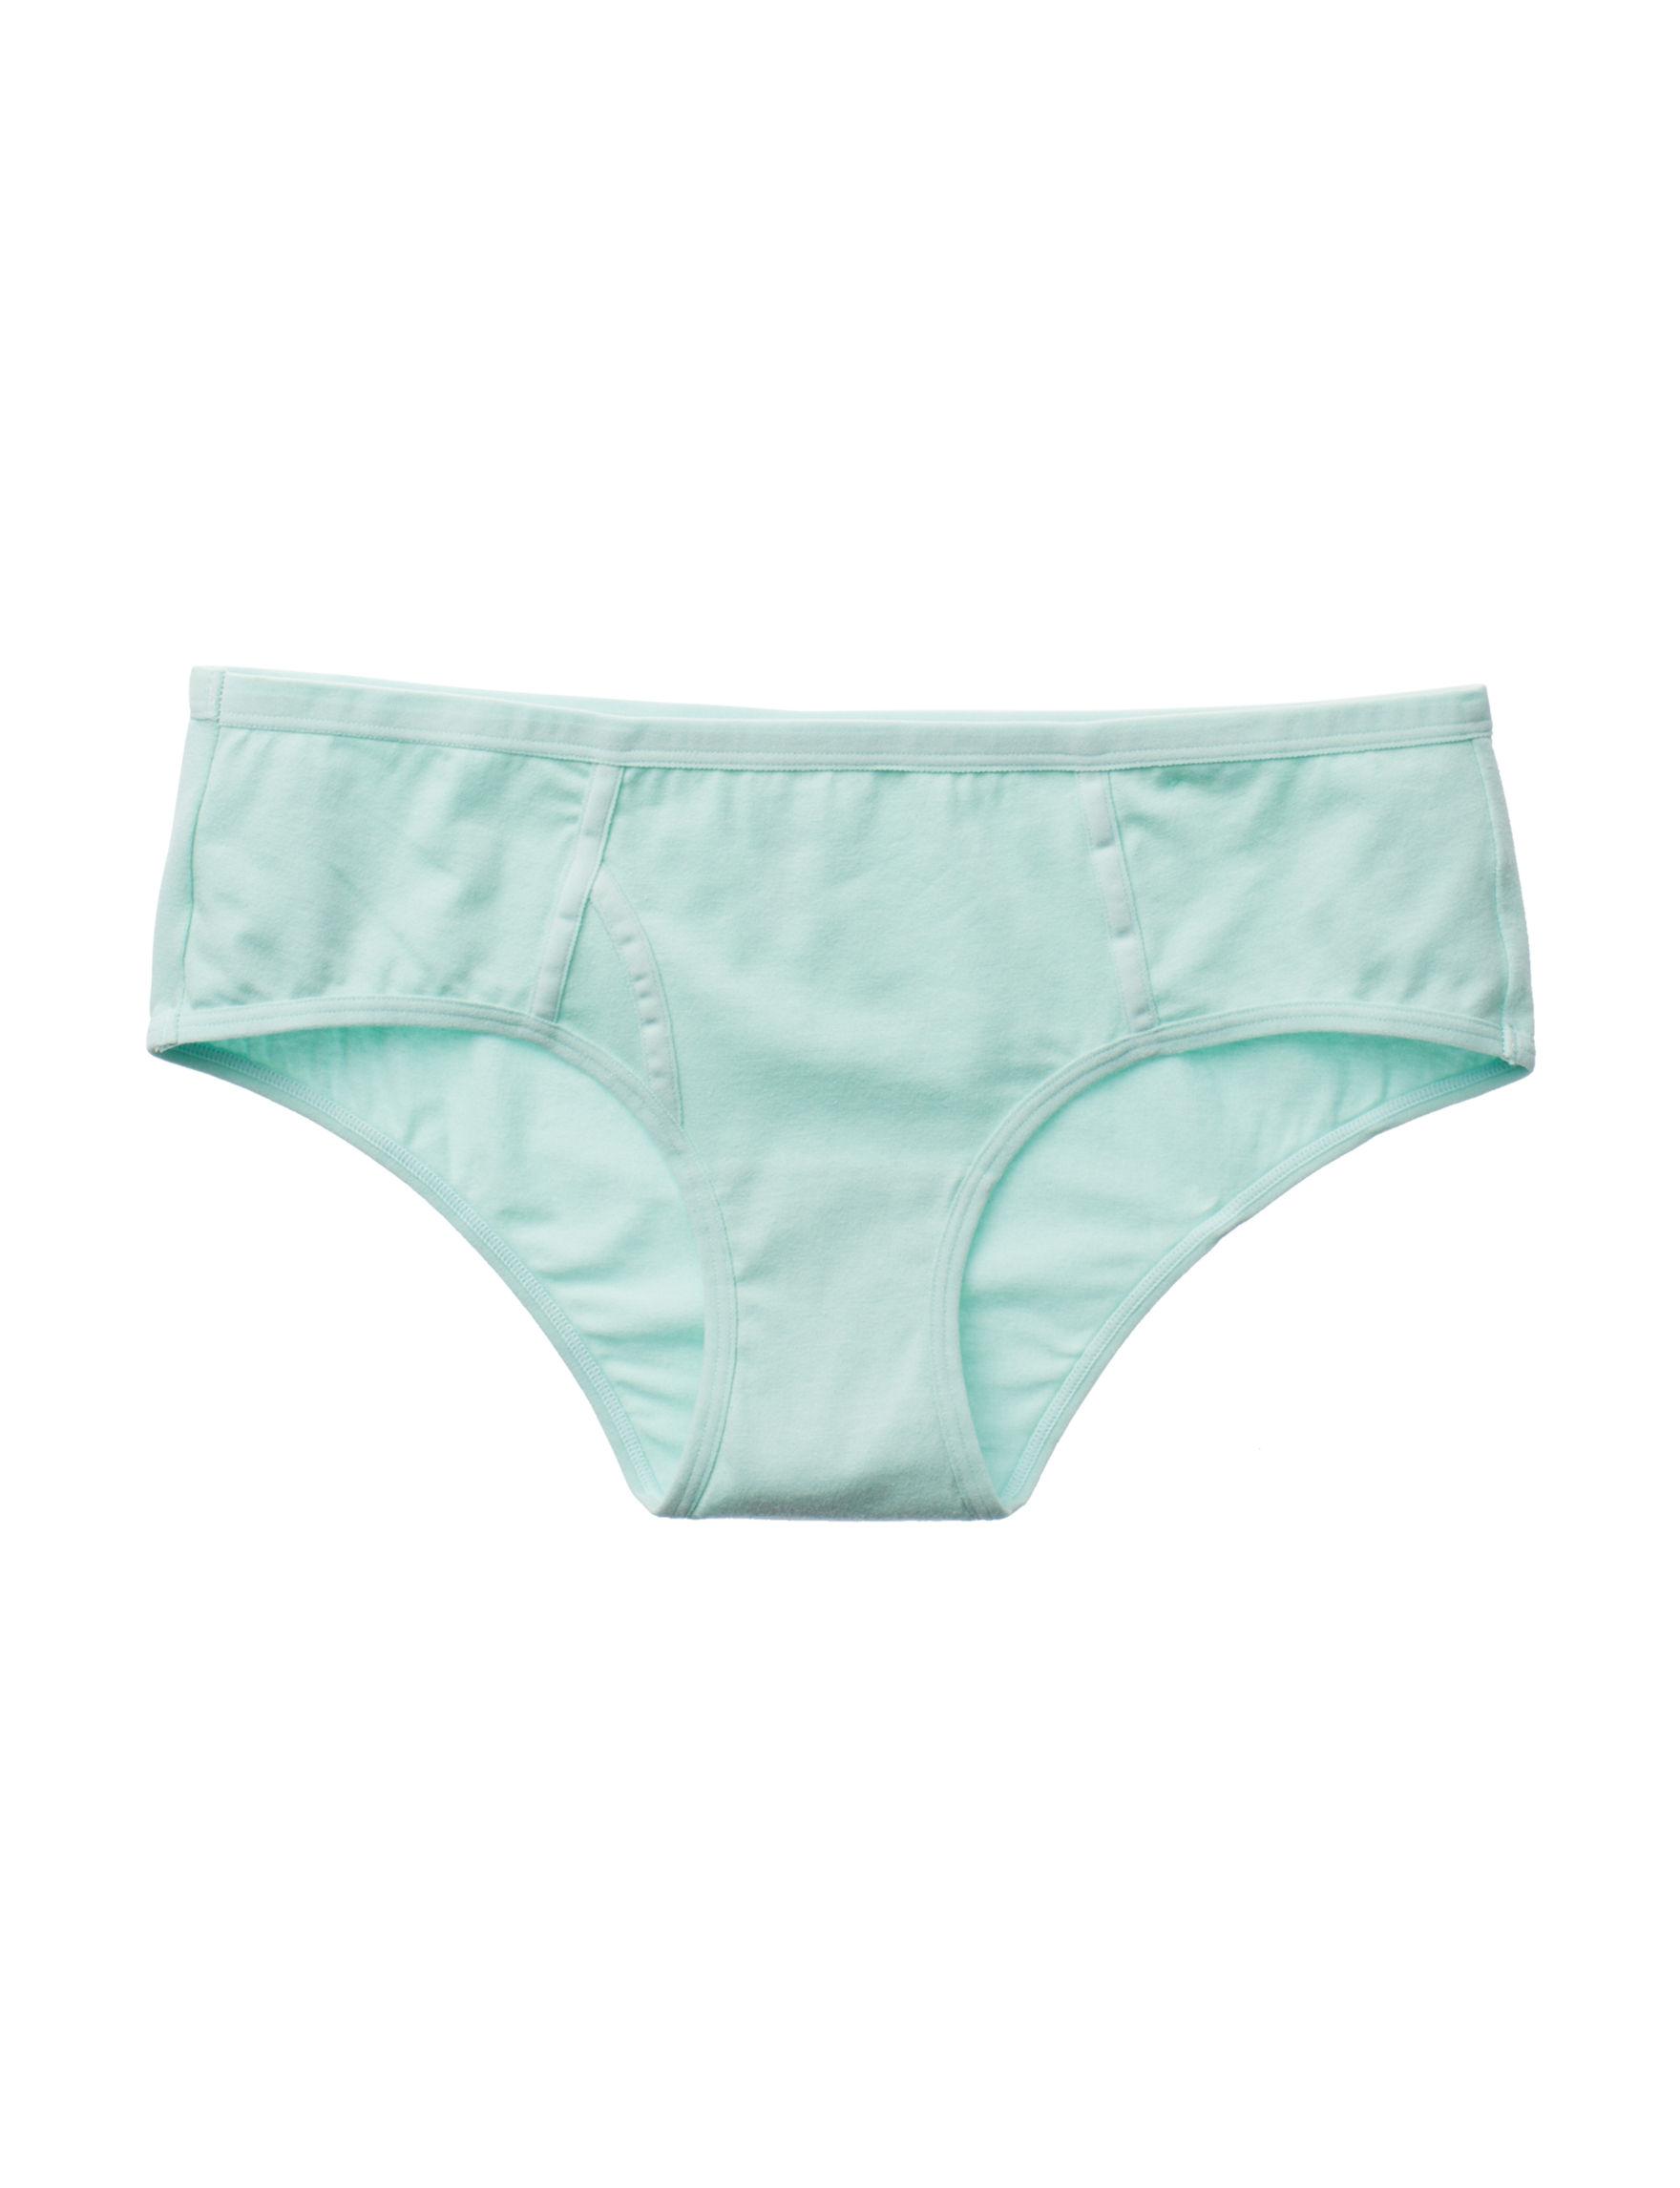 B Intimates Aqua Panties Boyshort Briefs